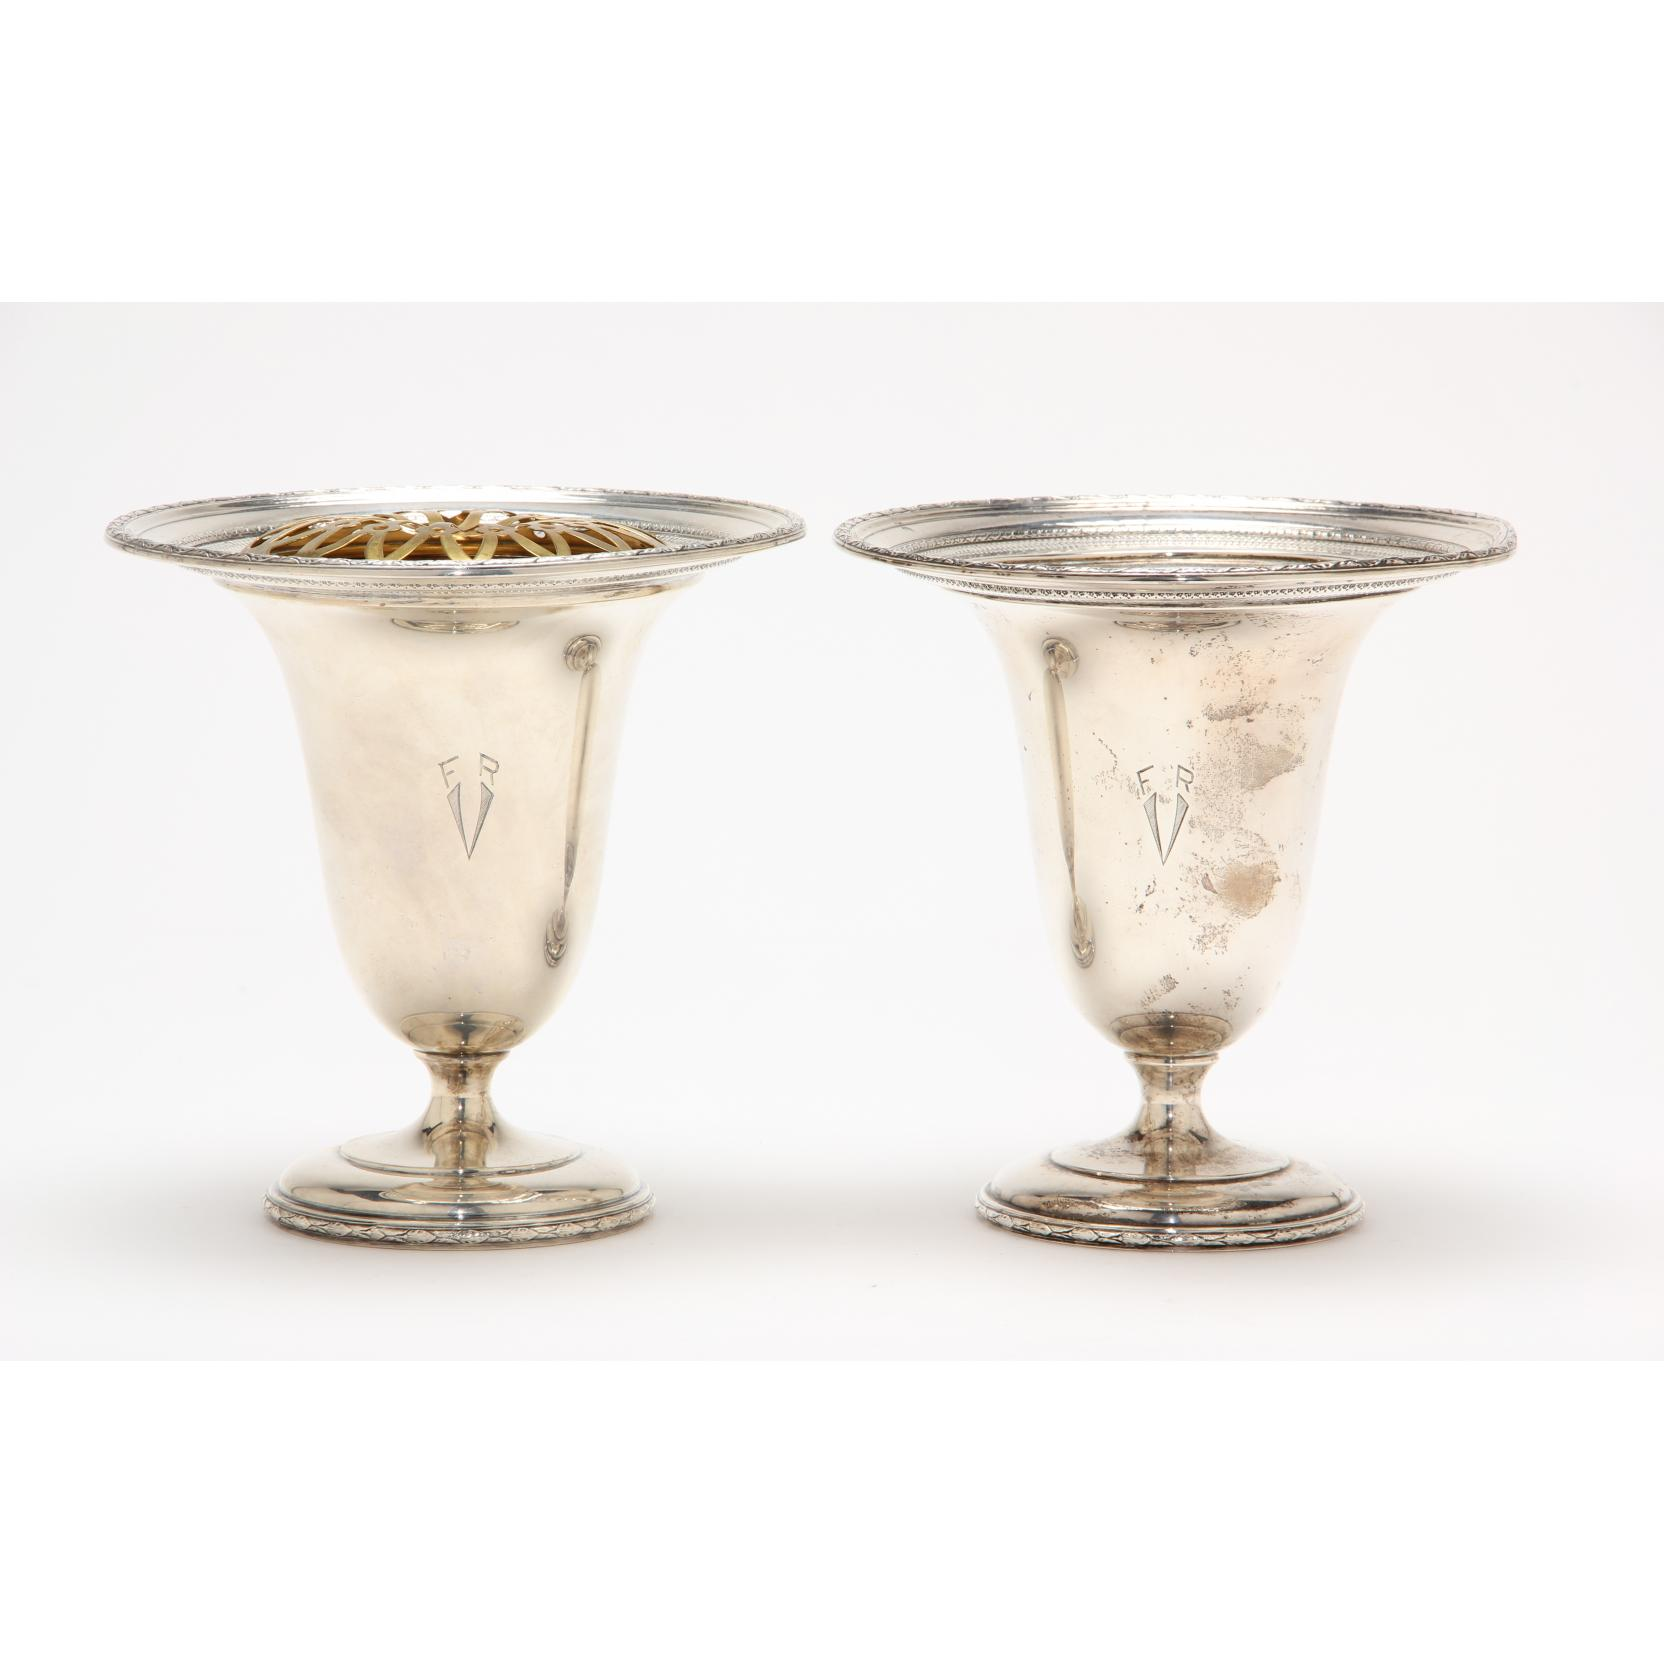 pair-of-sterling-silver-vases